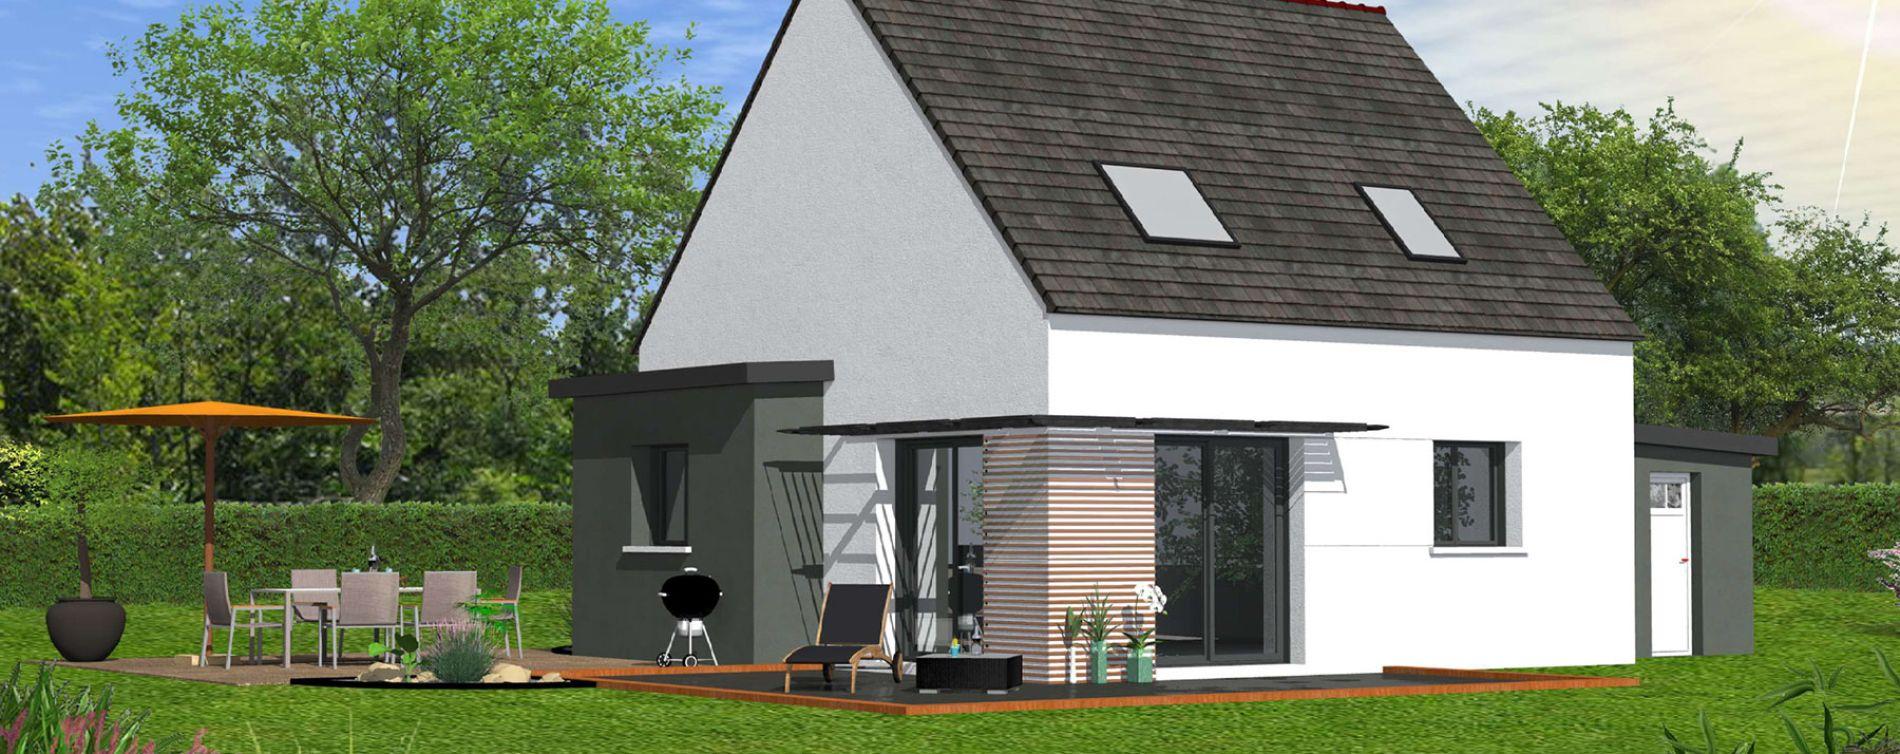 Trémaouézan : programme immobilier neuve « Langazel » (5)